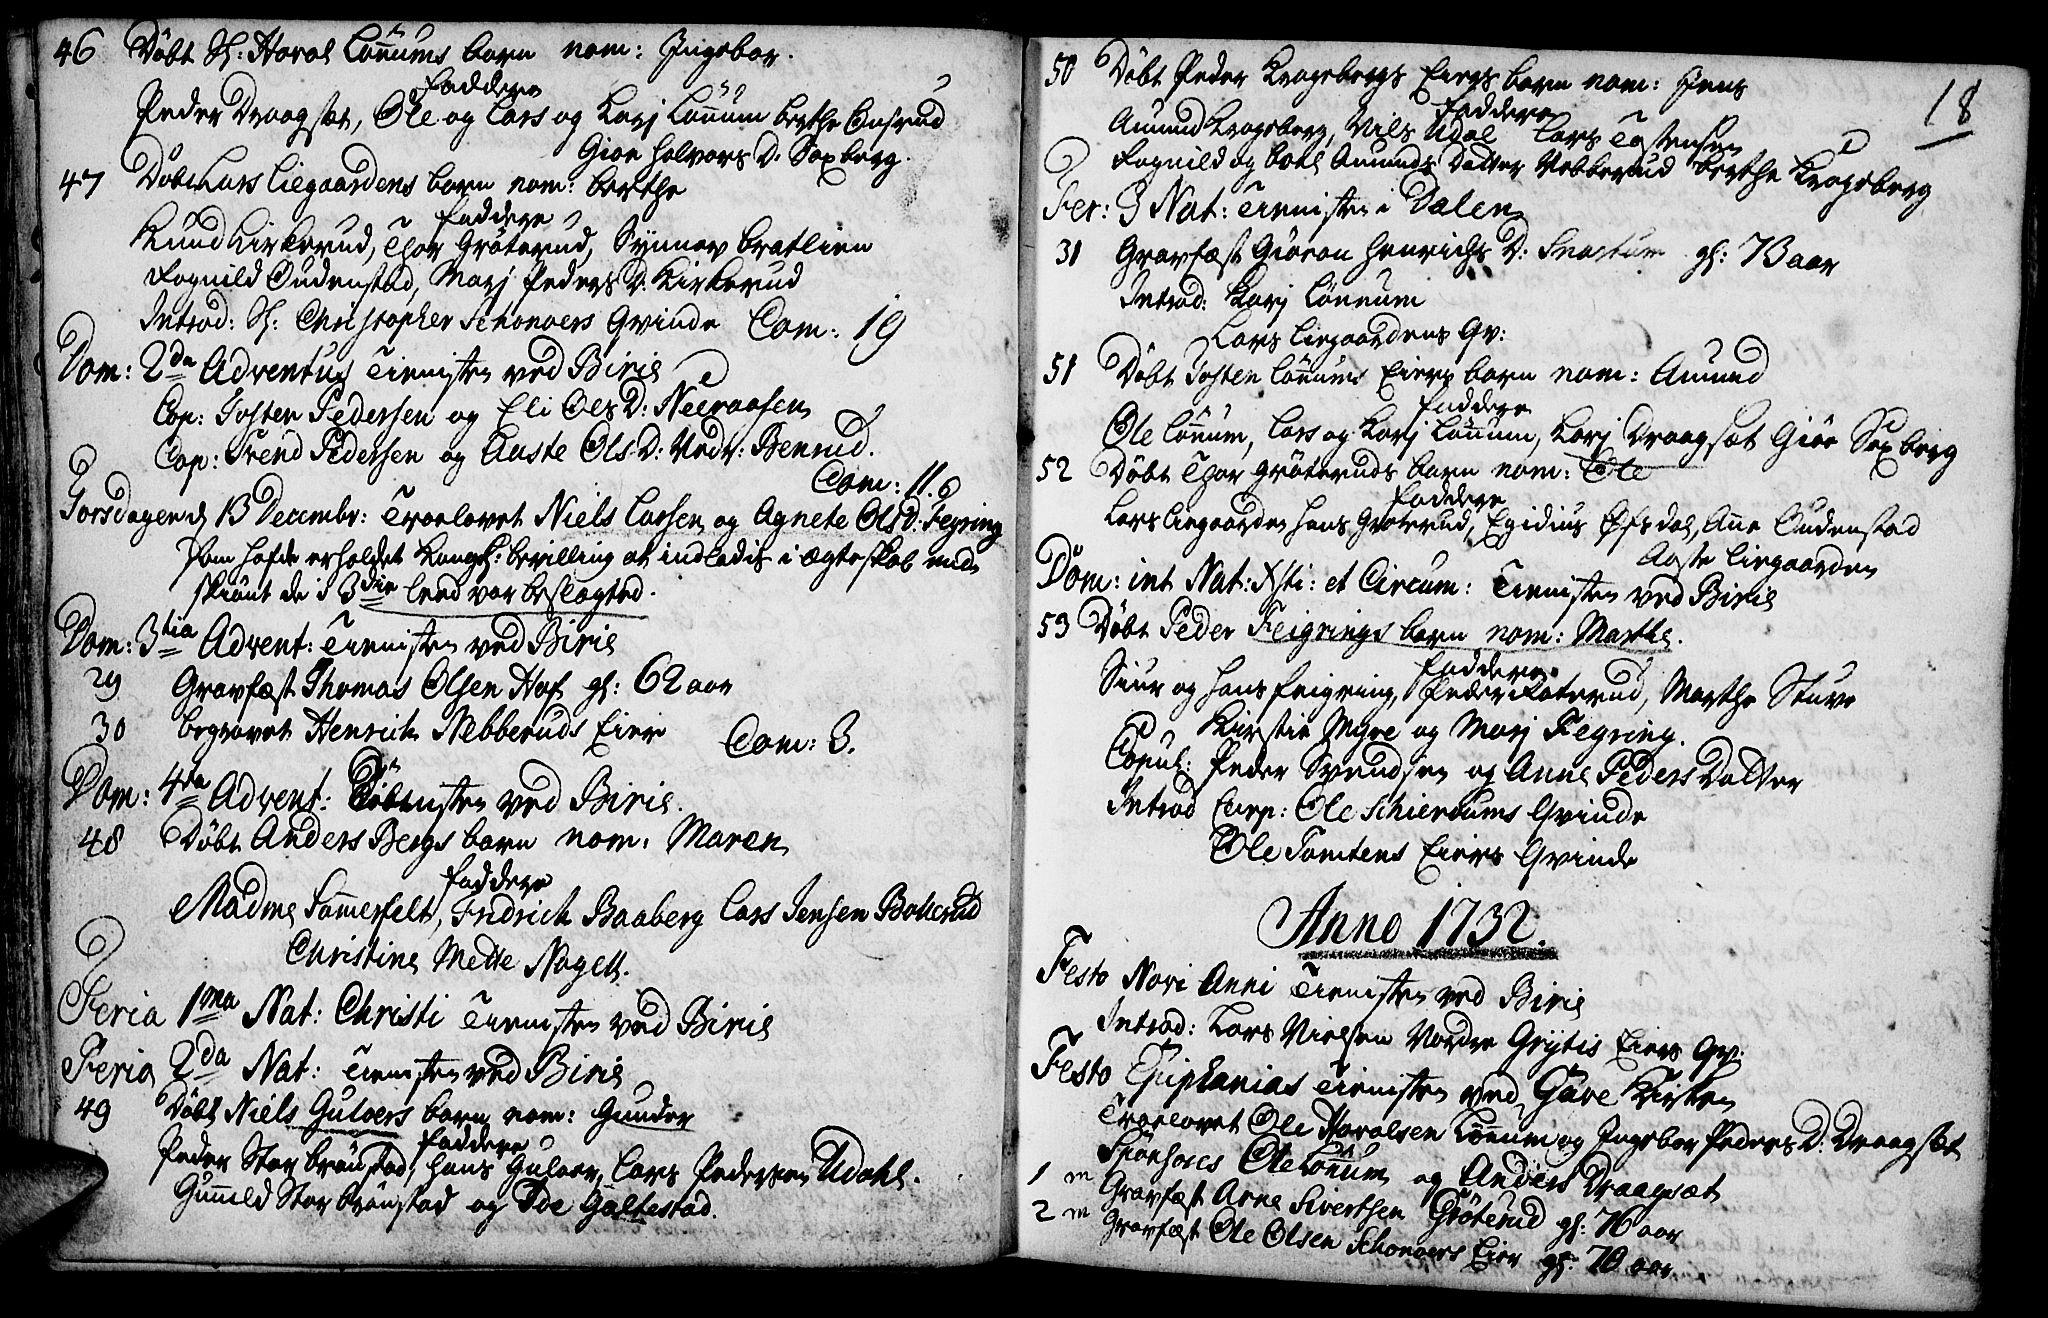 SAH, Biri prestekontor, Parish register (official) no. 1, 1730-1754, p. 18